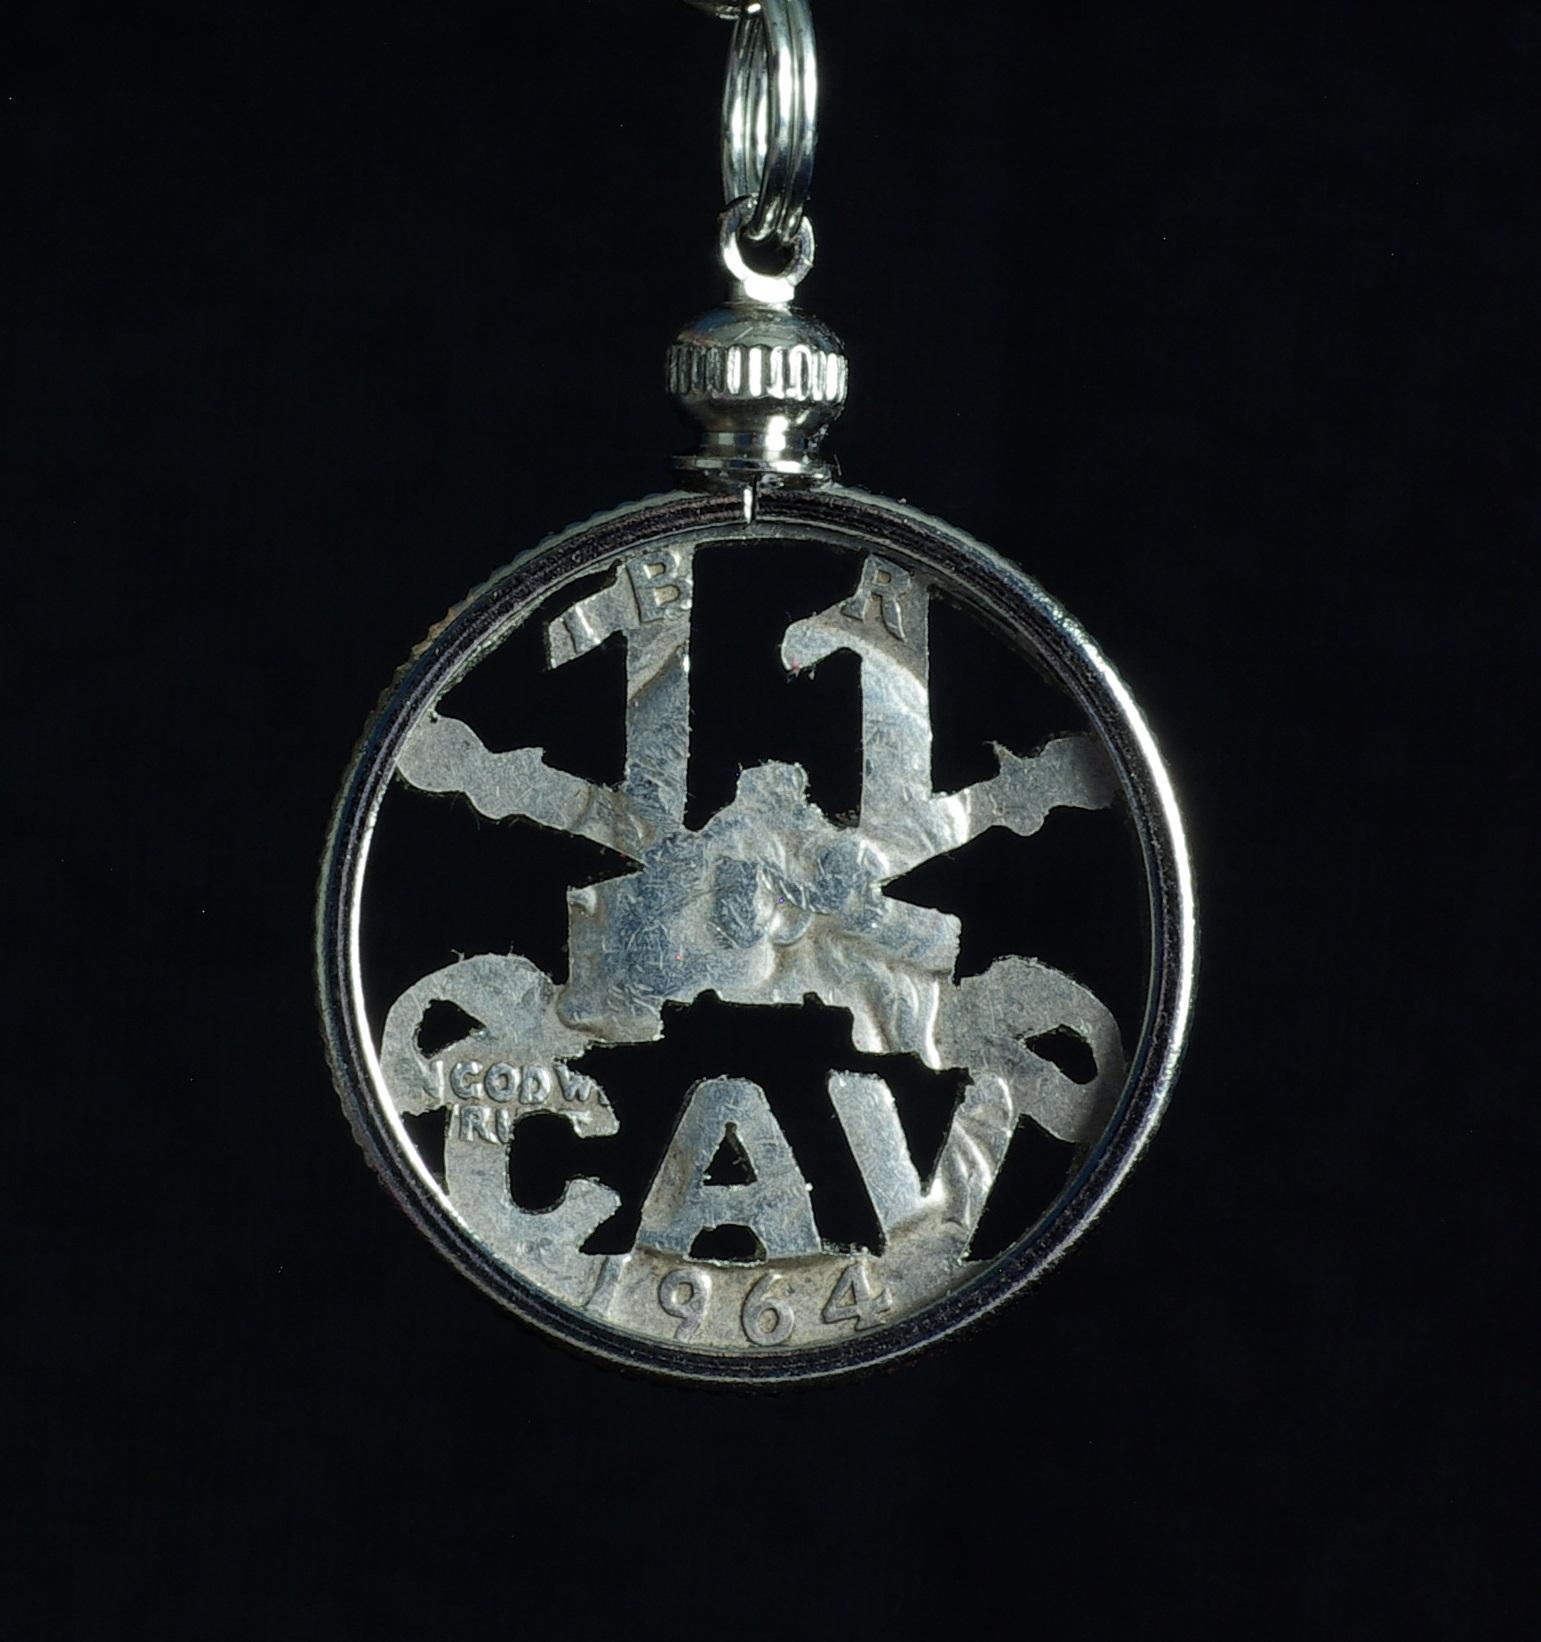 11th Cav Tank Division